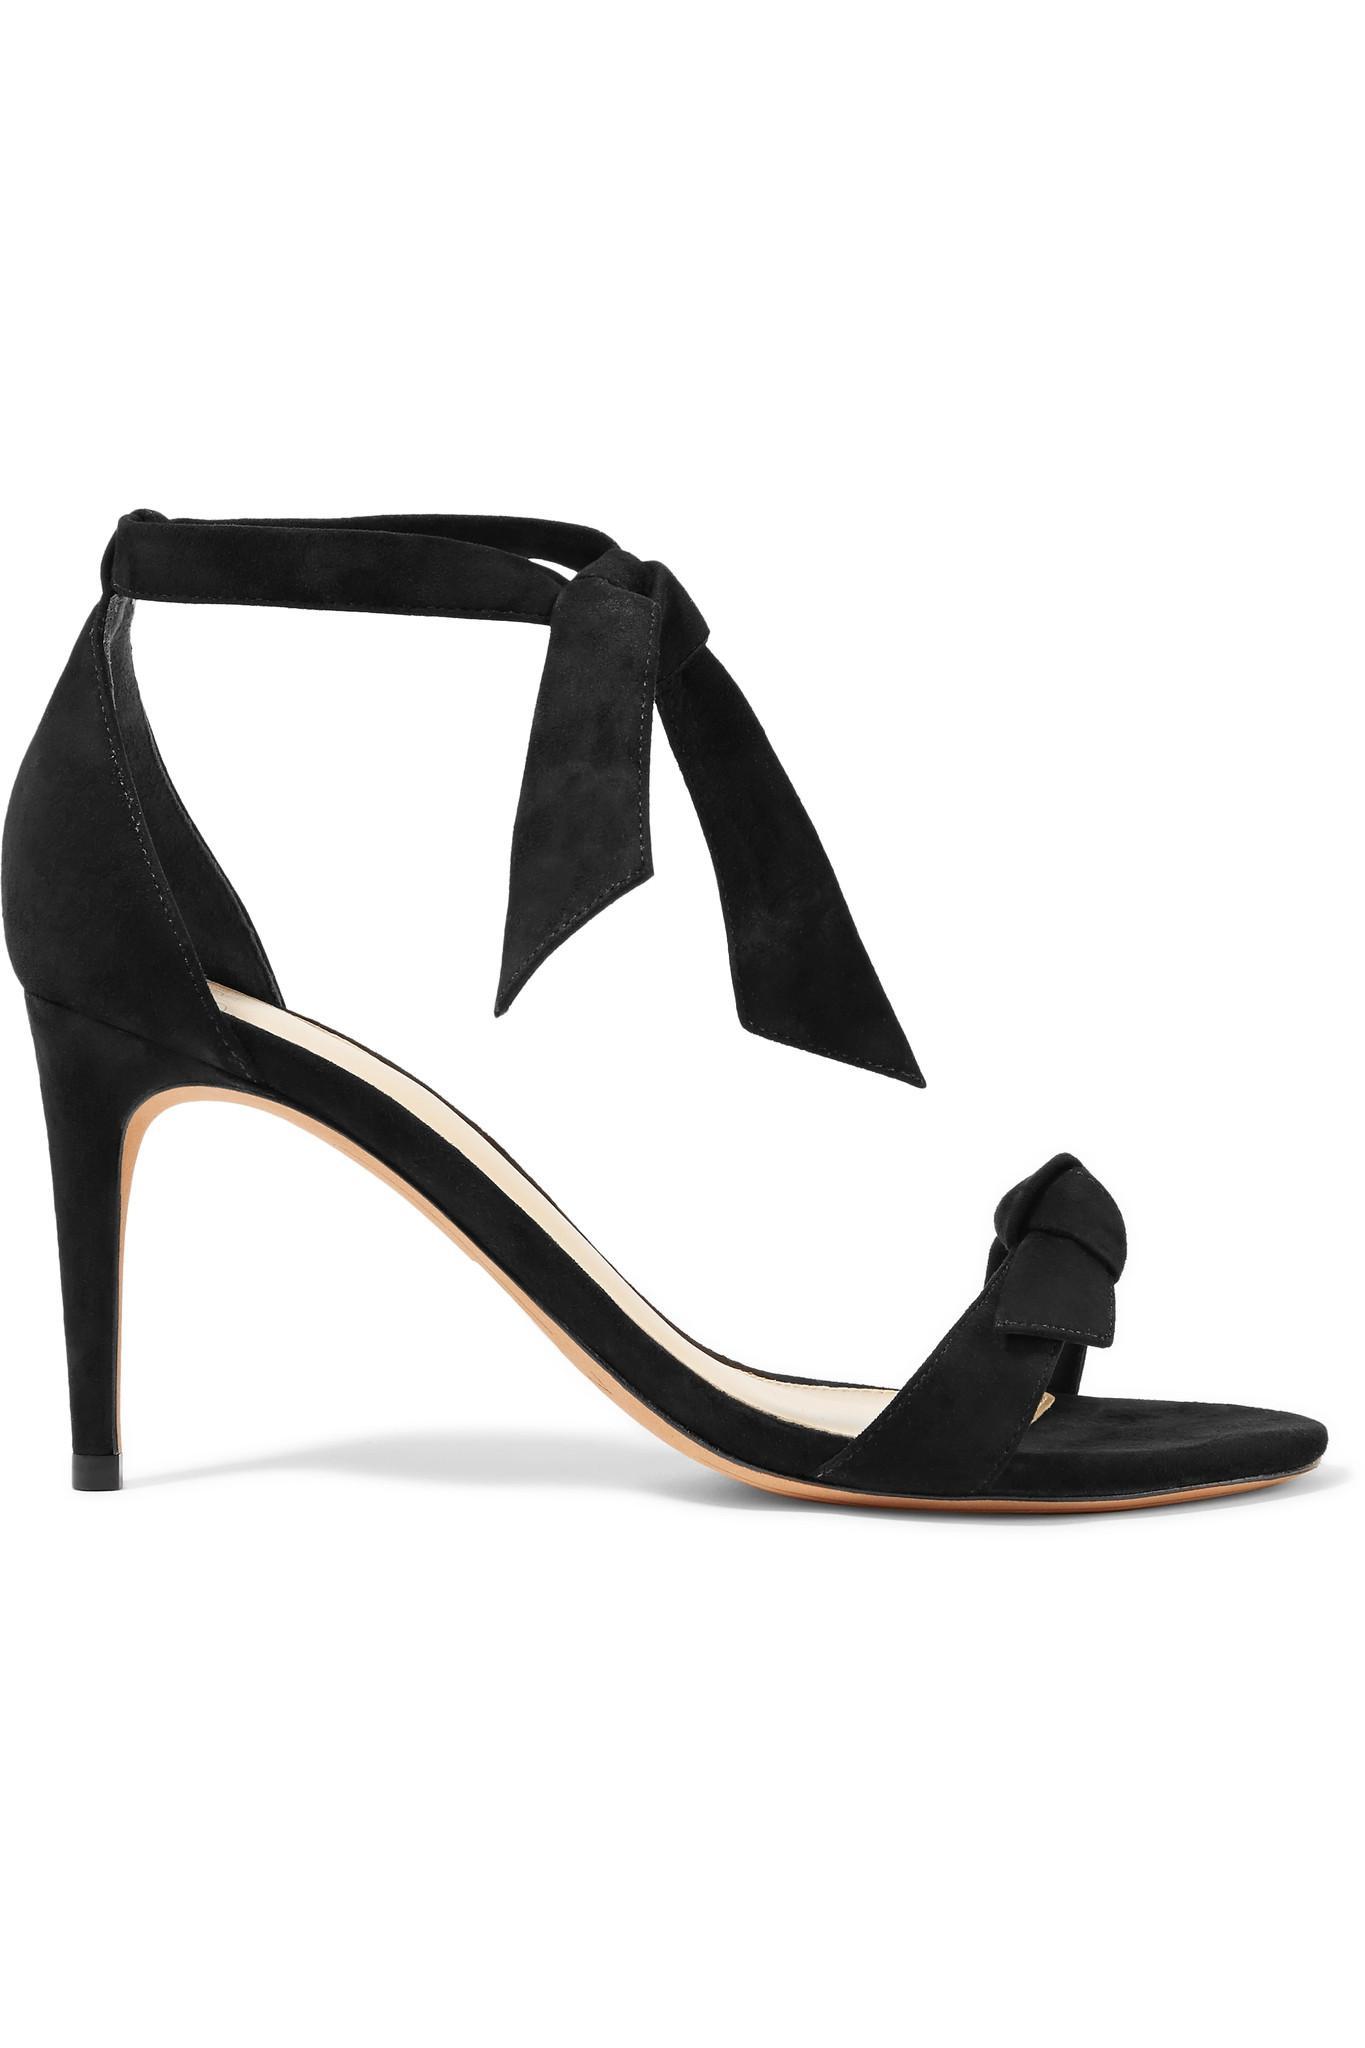 Clarita Bow-embellished Suede Sandals - Black Alexandre Birman TwD7hbQ8